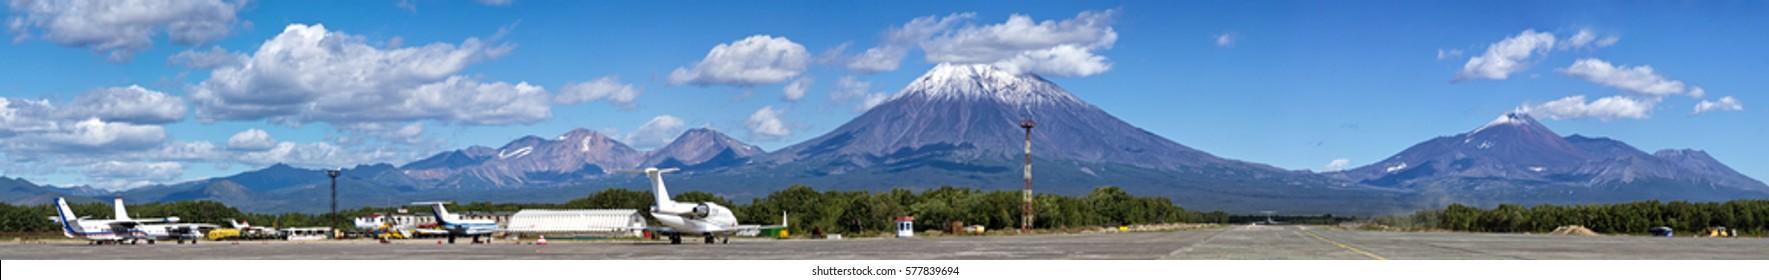 Kamchatka,Russia- September 4,2012: Views of Koryaksky and Avachinsky volcano. Yelizovo airport near Petropavlovsk-Kamchatsky.